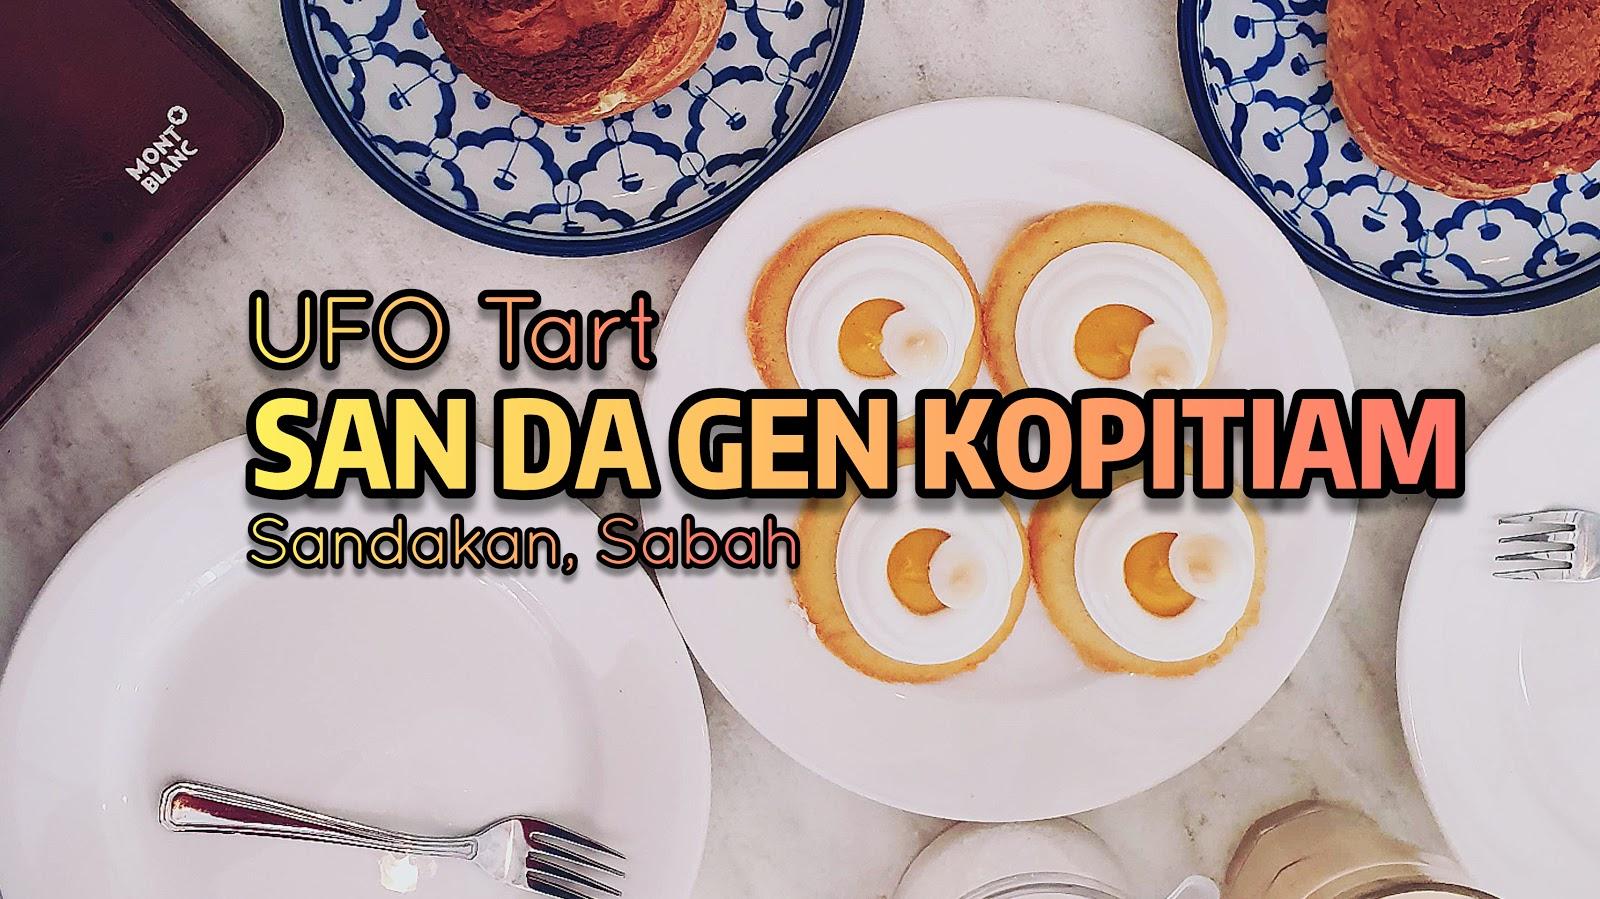 Tempat Best Untuk Makan UFO Tart di Sandakan | San Da Gen Kopitiam's Specials!